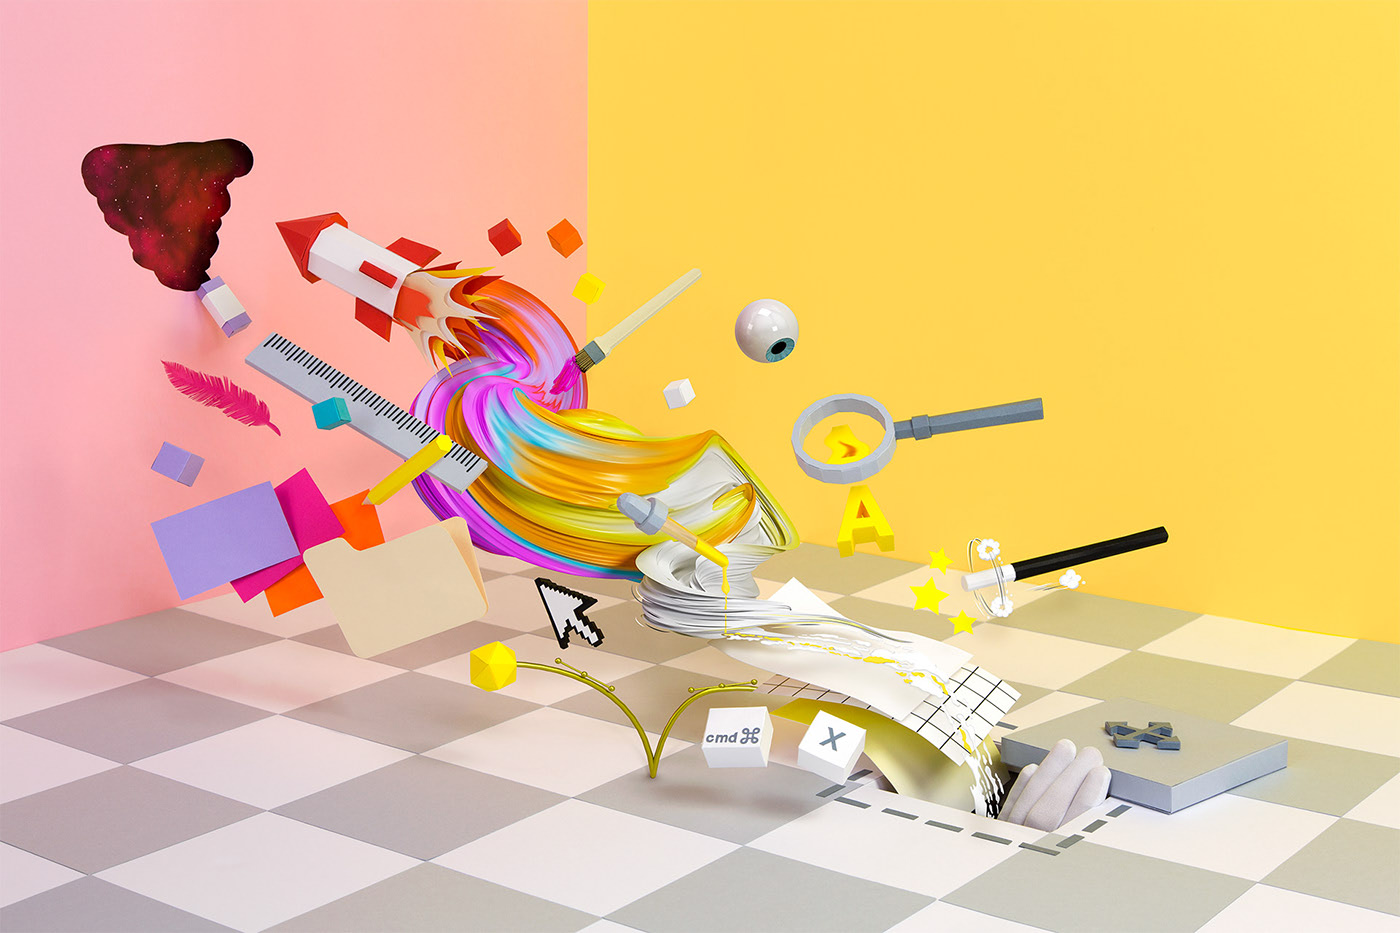 Art Direction, Creative Direction, Animation